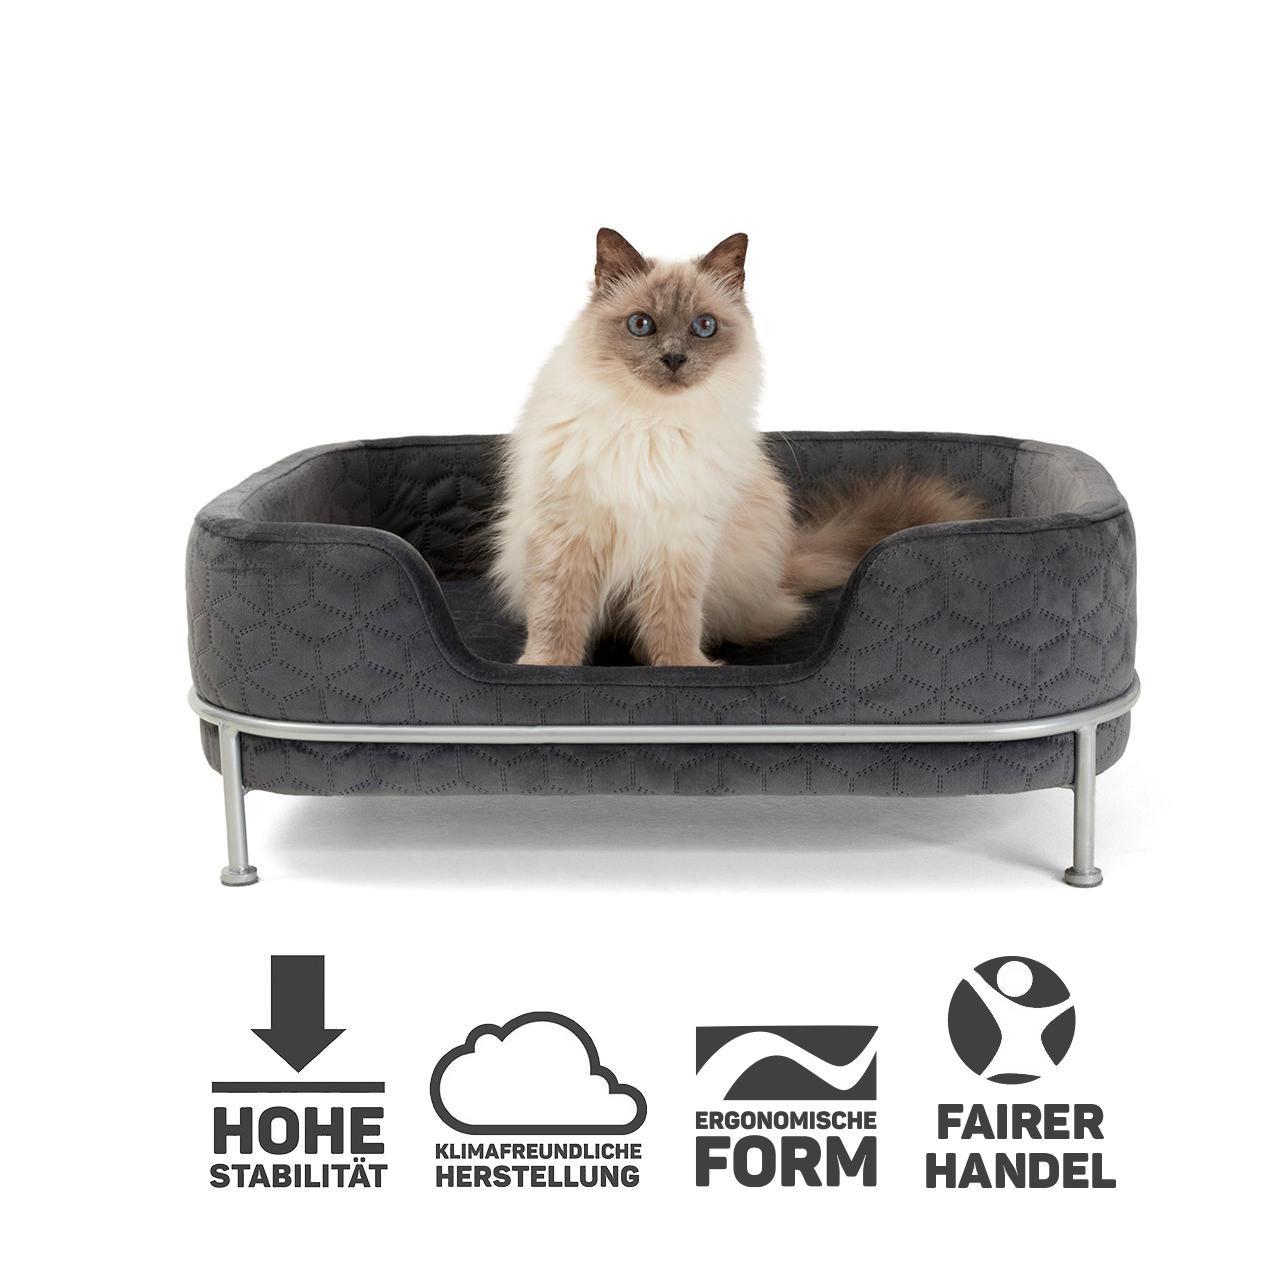 13+ Berth Pet bed Windsor   8 x 8,8 x 28,8 cm   grey   Cat basket ... Stock